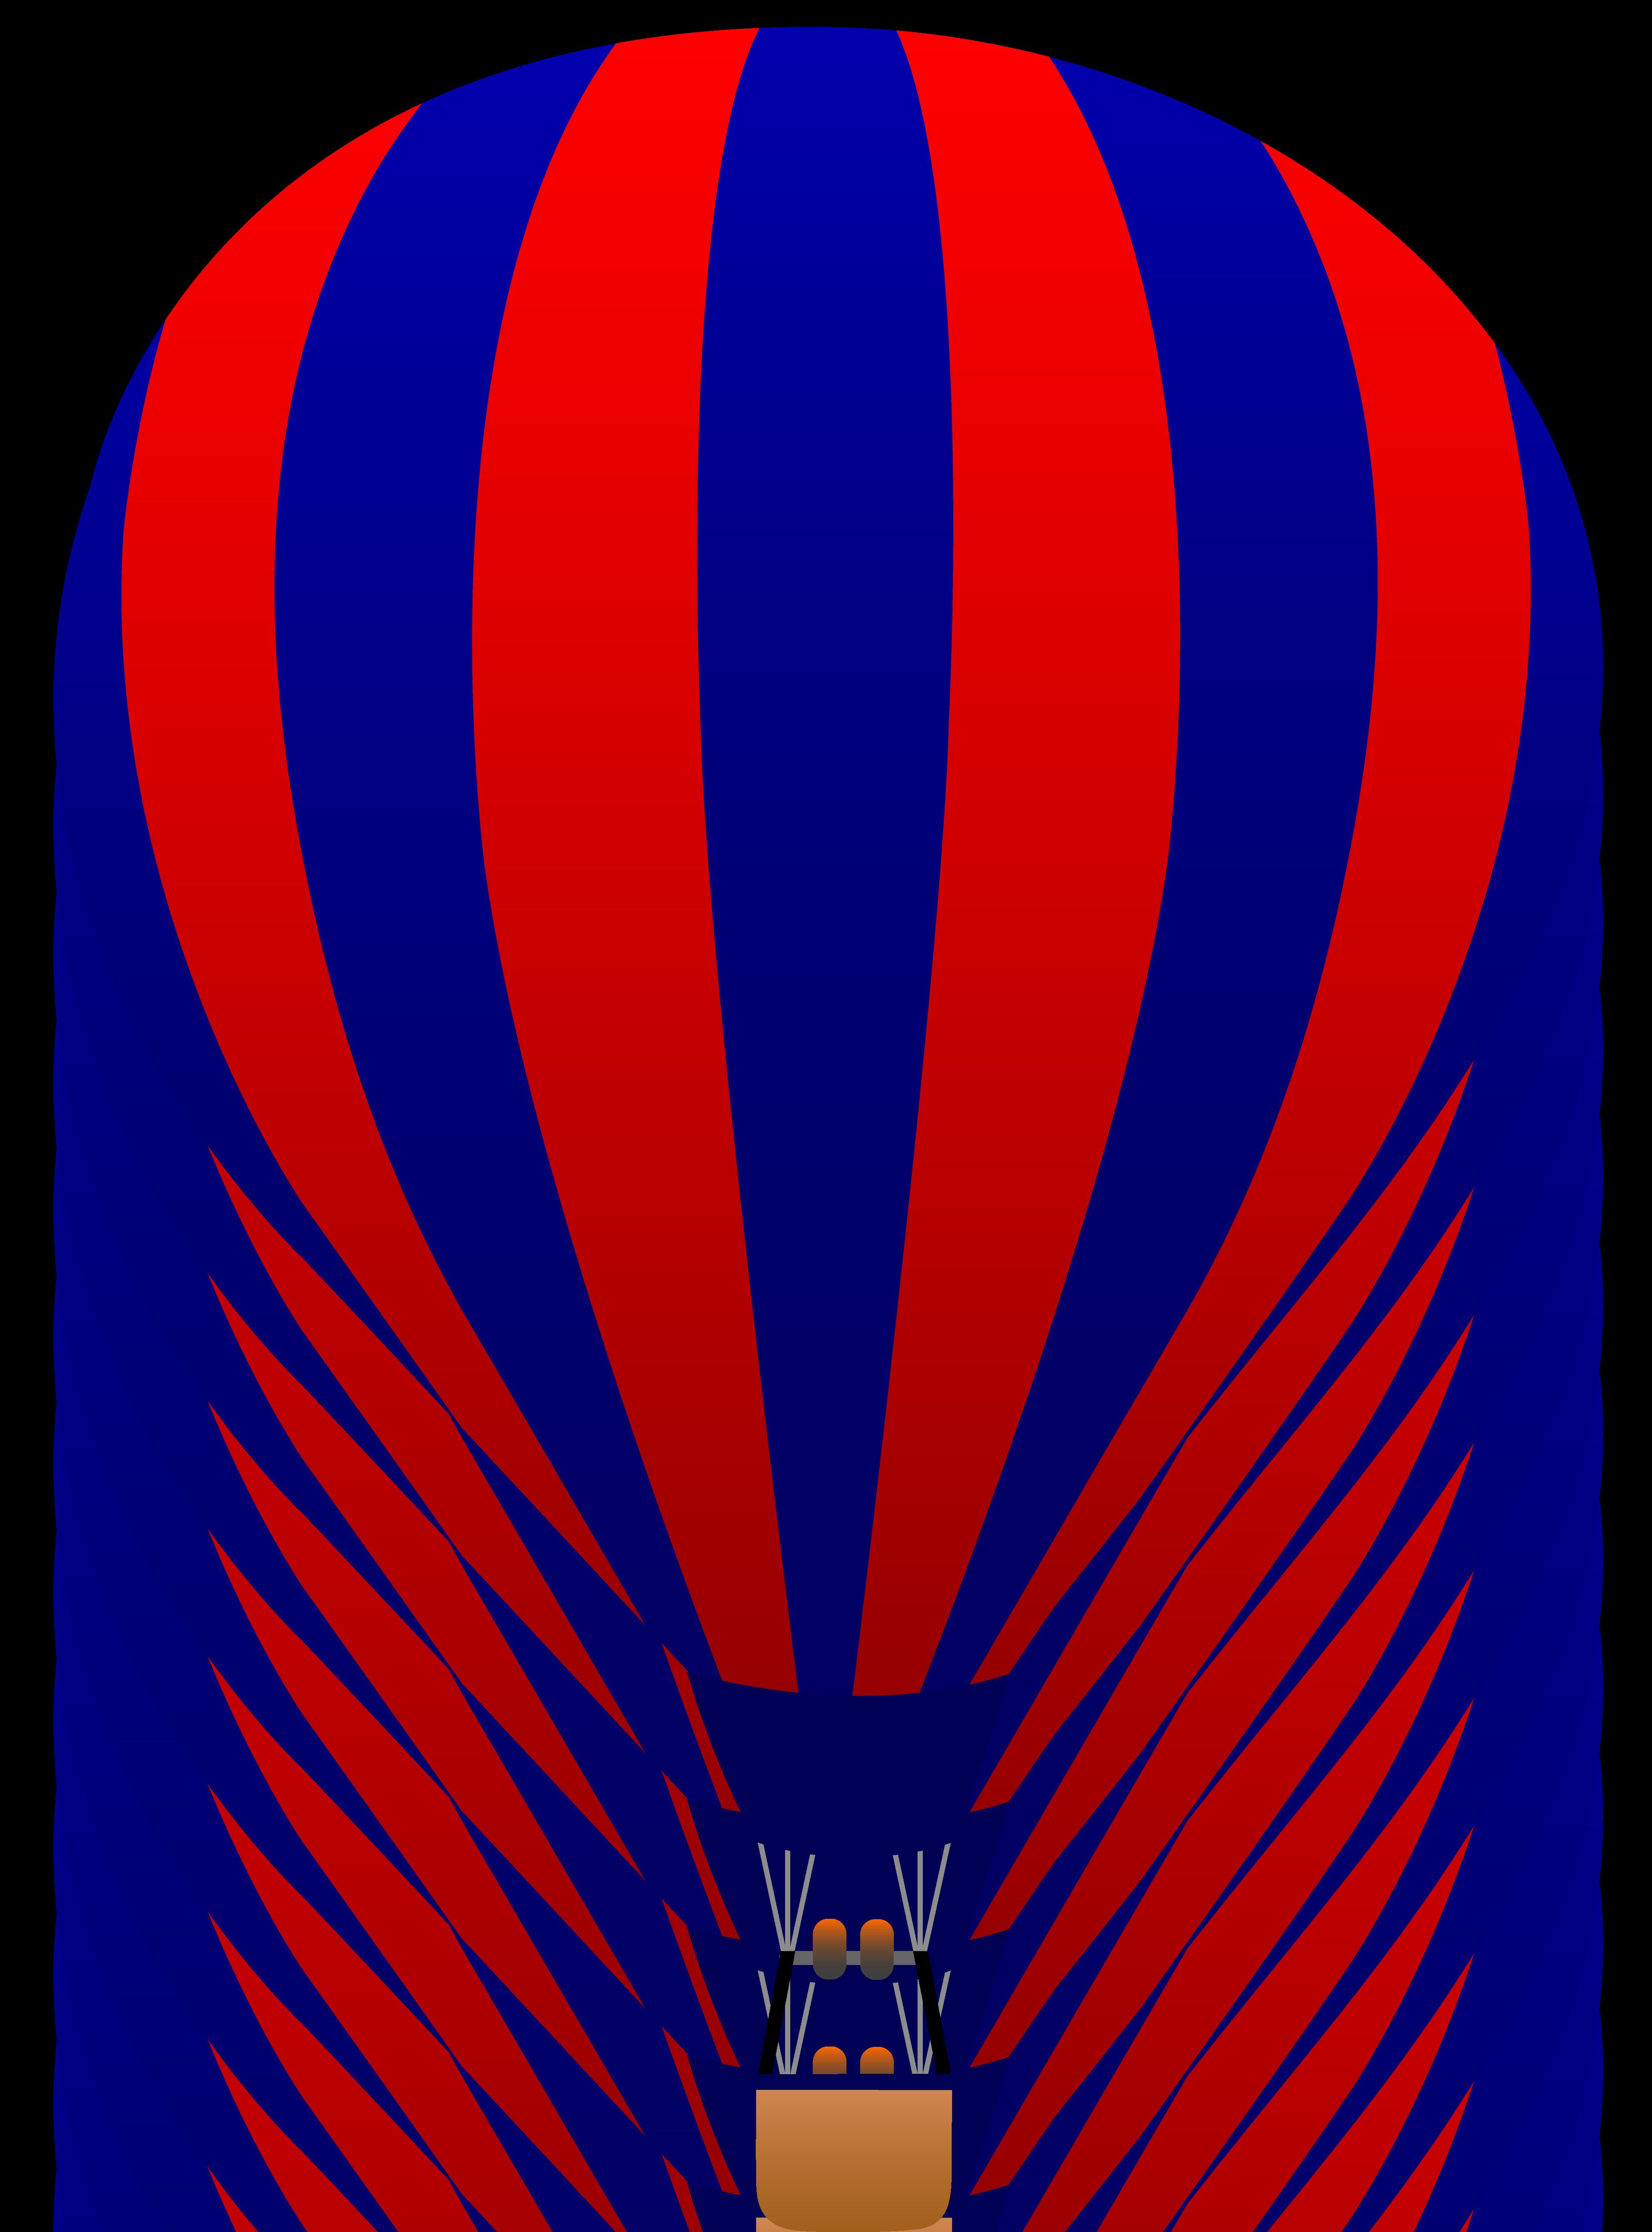 jpg transparent library Ballon clipart lkg. Balloon png panda free.